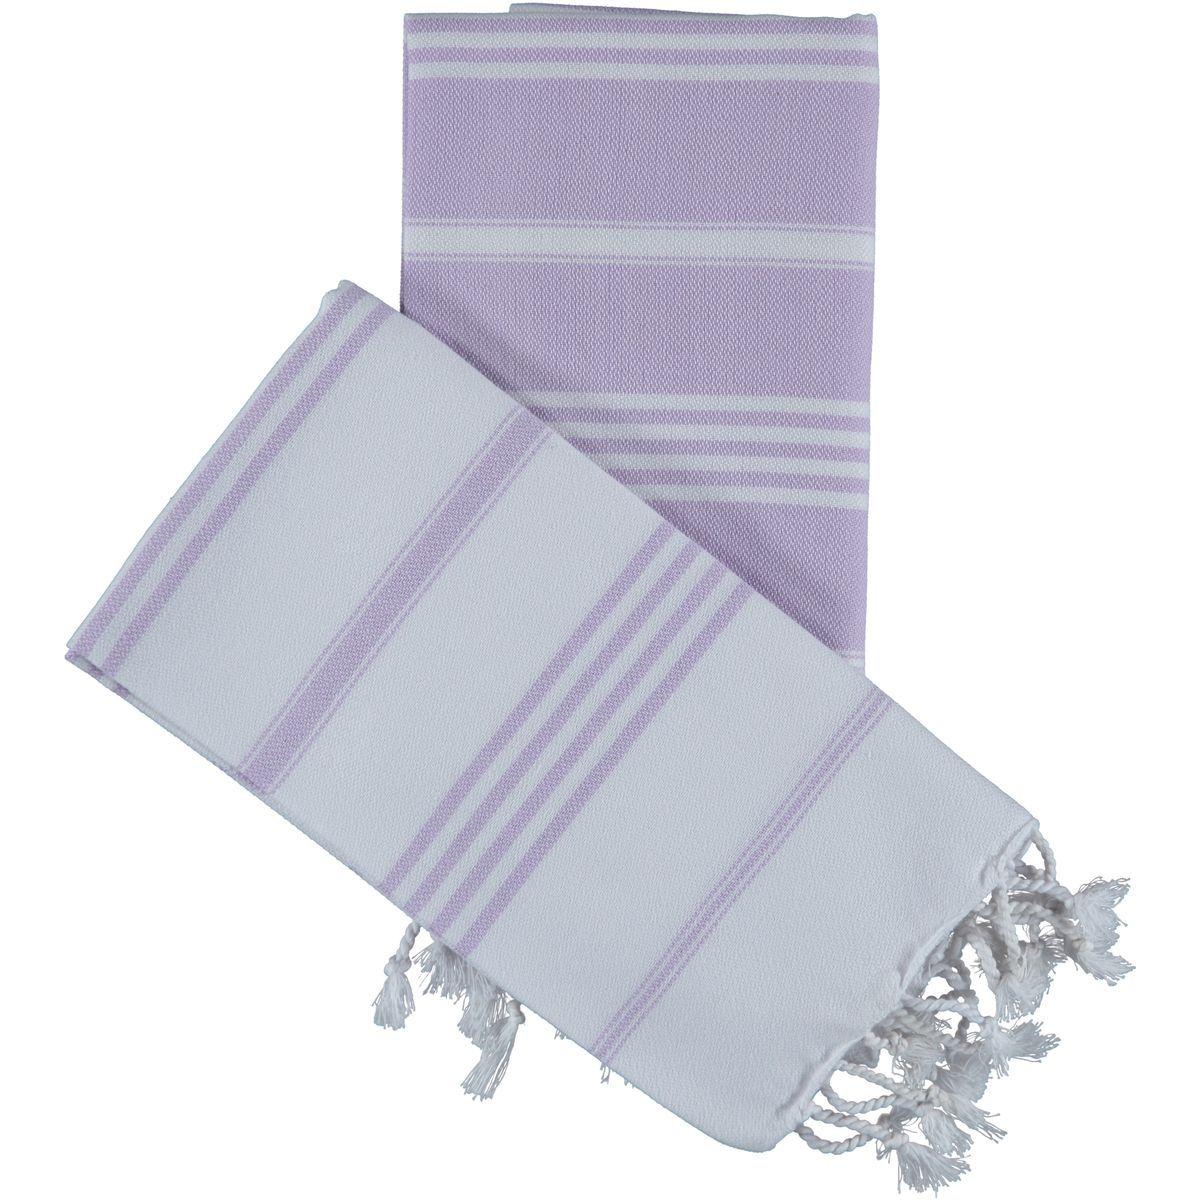 Peshkir Leyla / Lilac - Lavender stripes